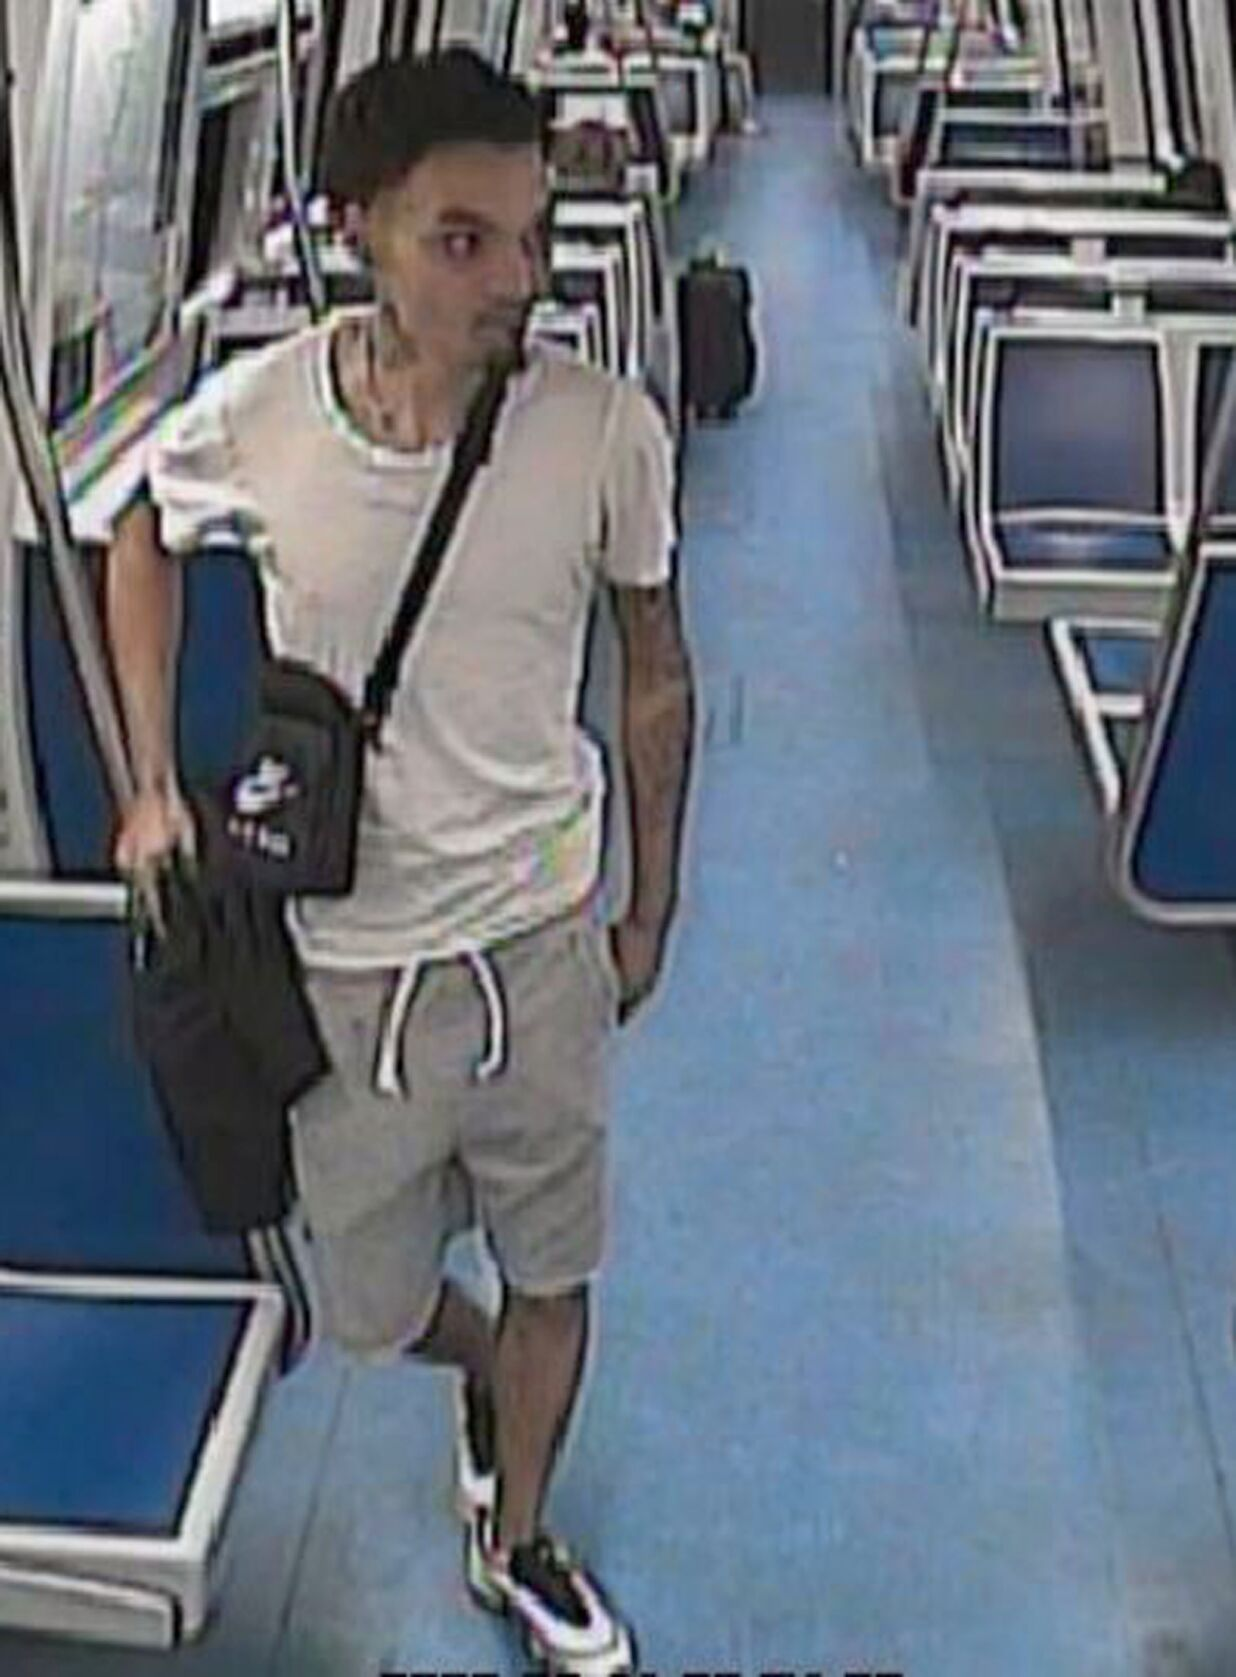 042121_MNS_Hunt_robberies Christian Kwan Hunt